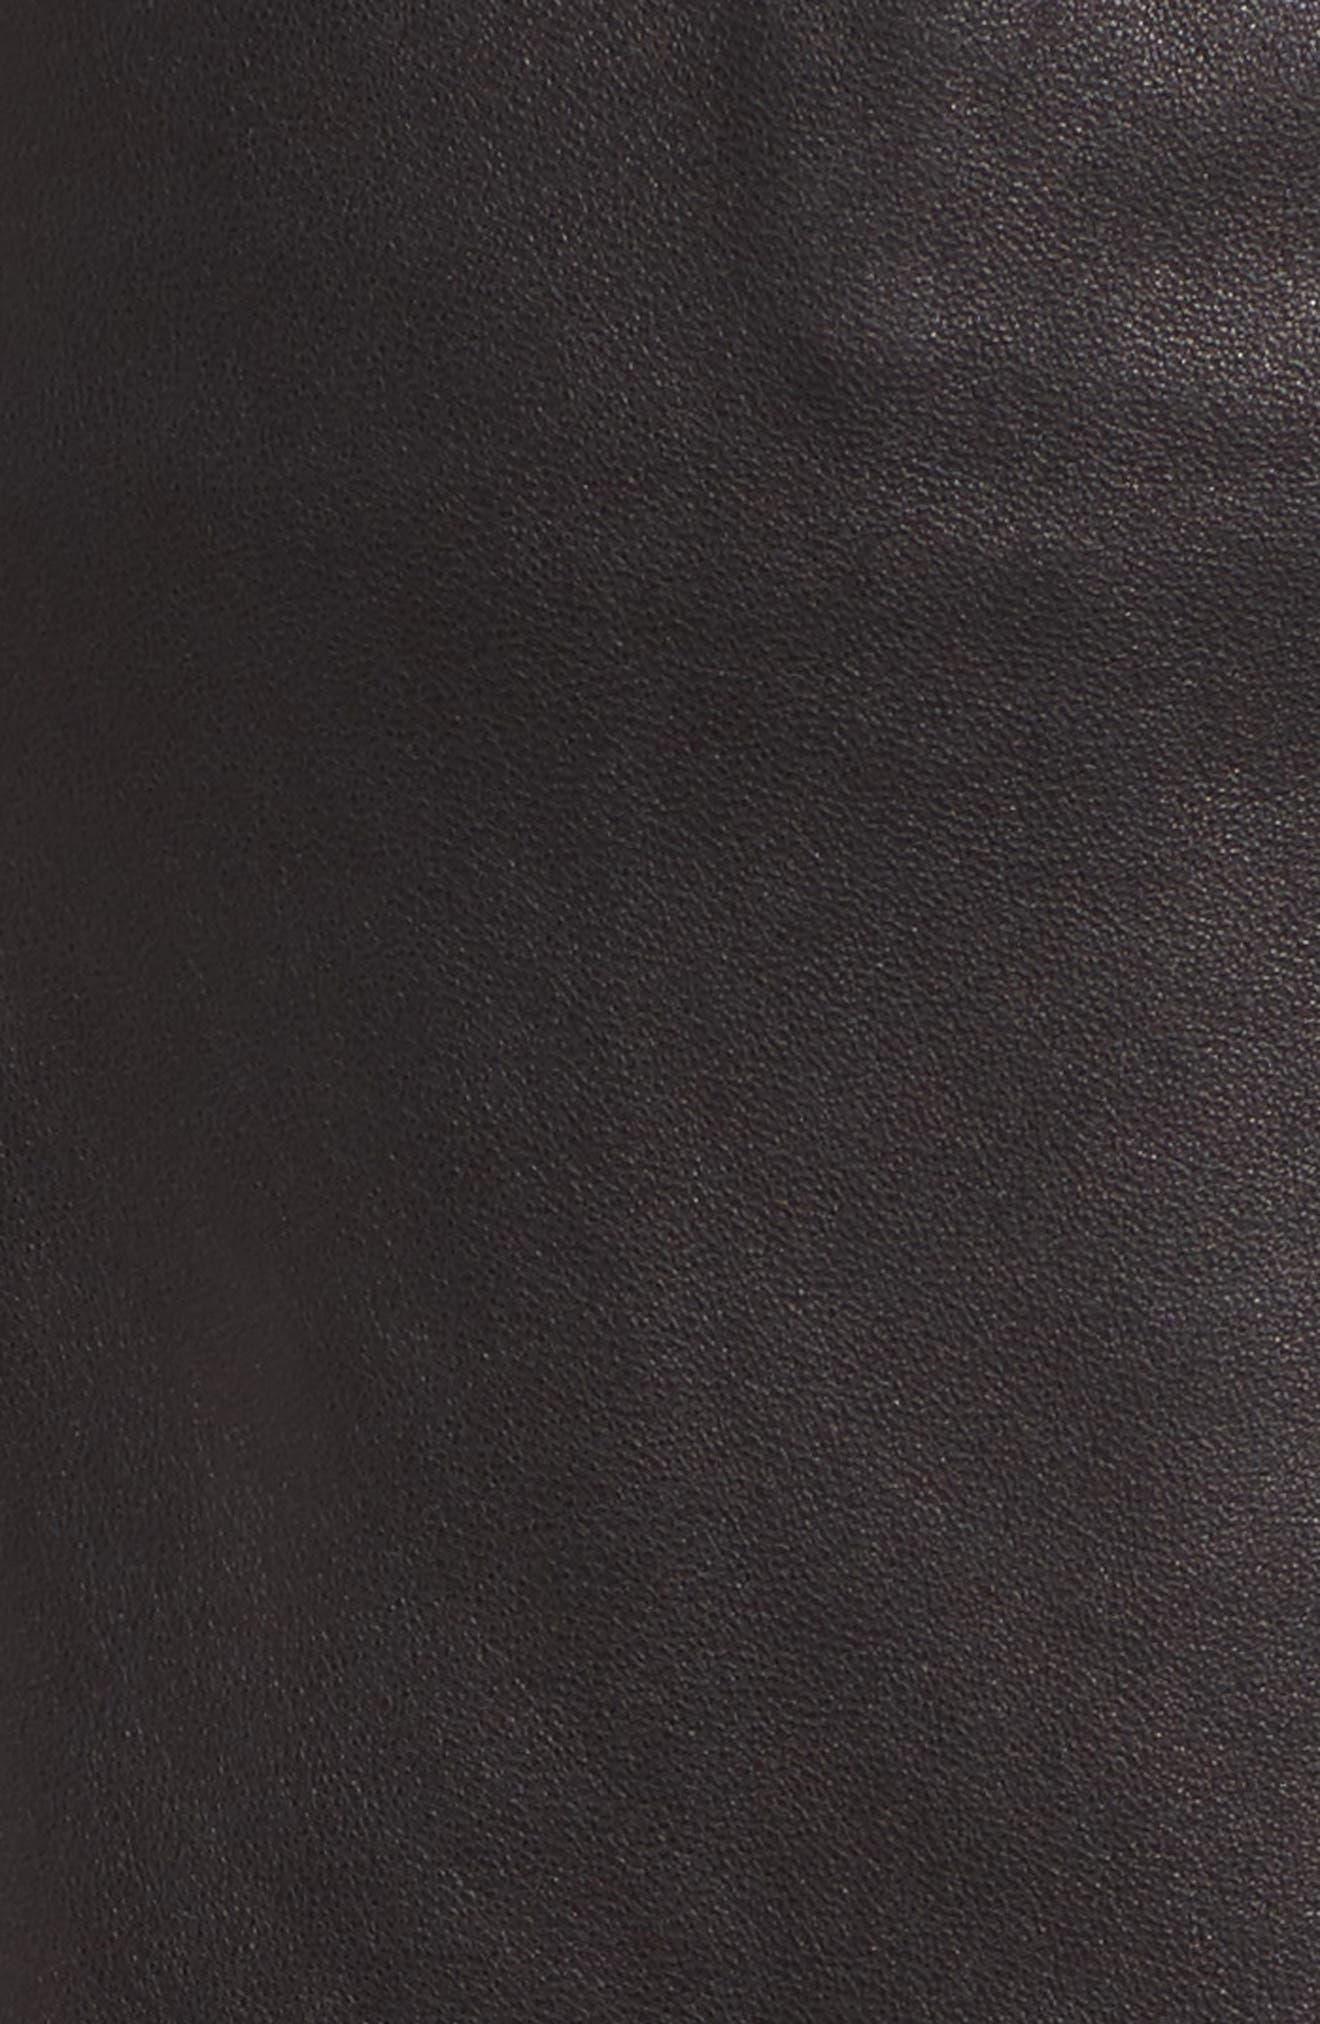 Grommet Suede Miniskirt,                             Alternate thumbnail 5, color,